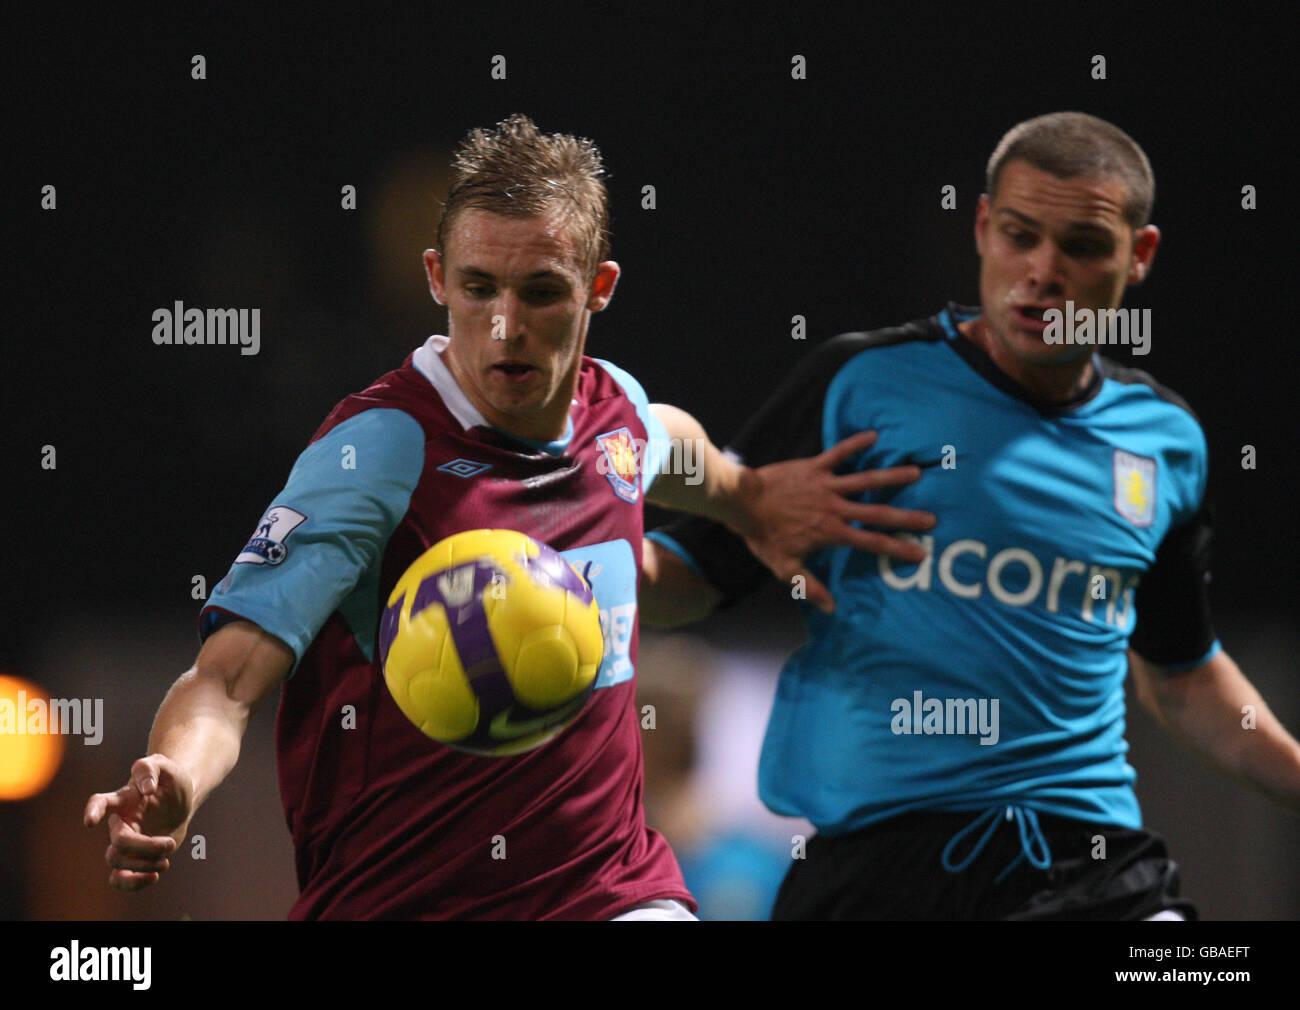 Soccer - Barclays Premier League - West Ham United v Aston Villa - Upton Park - Stock Image